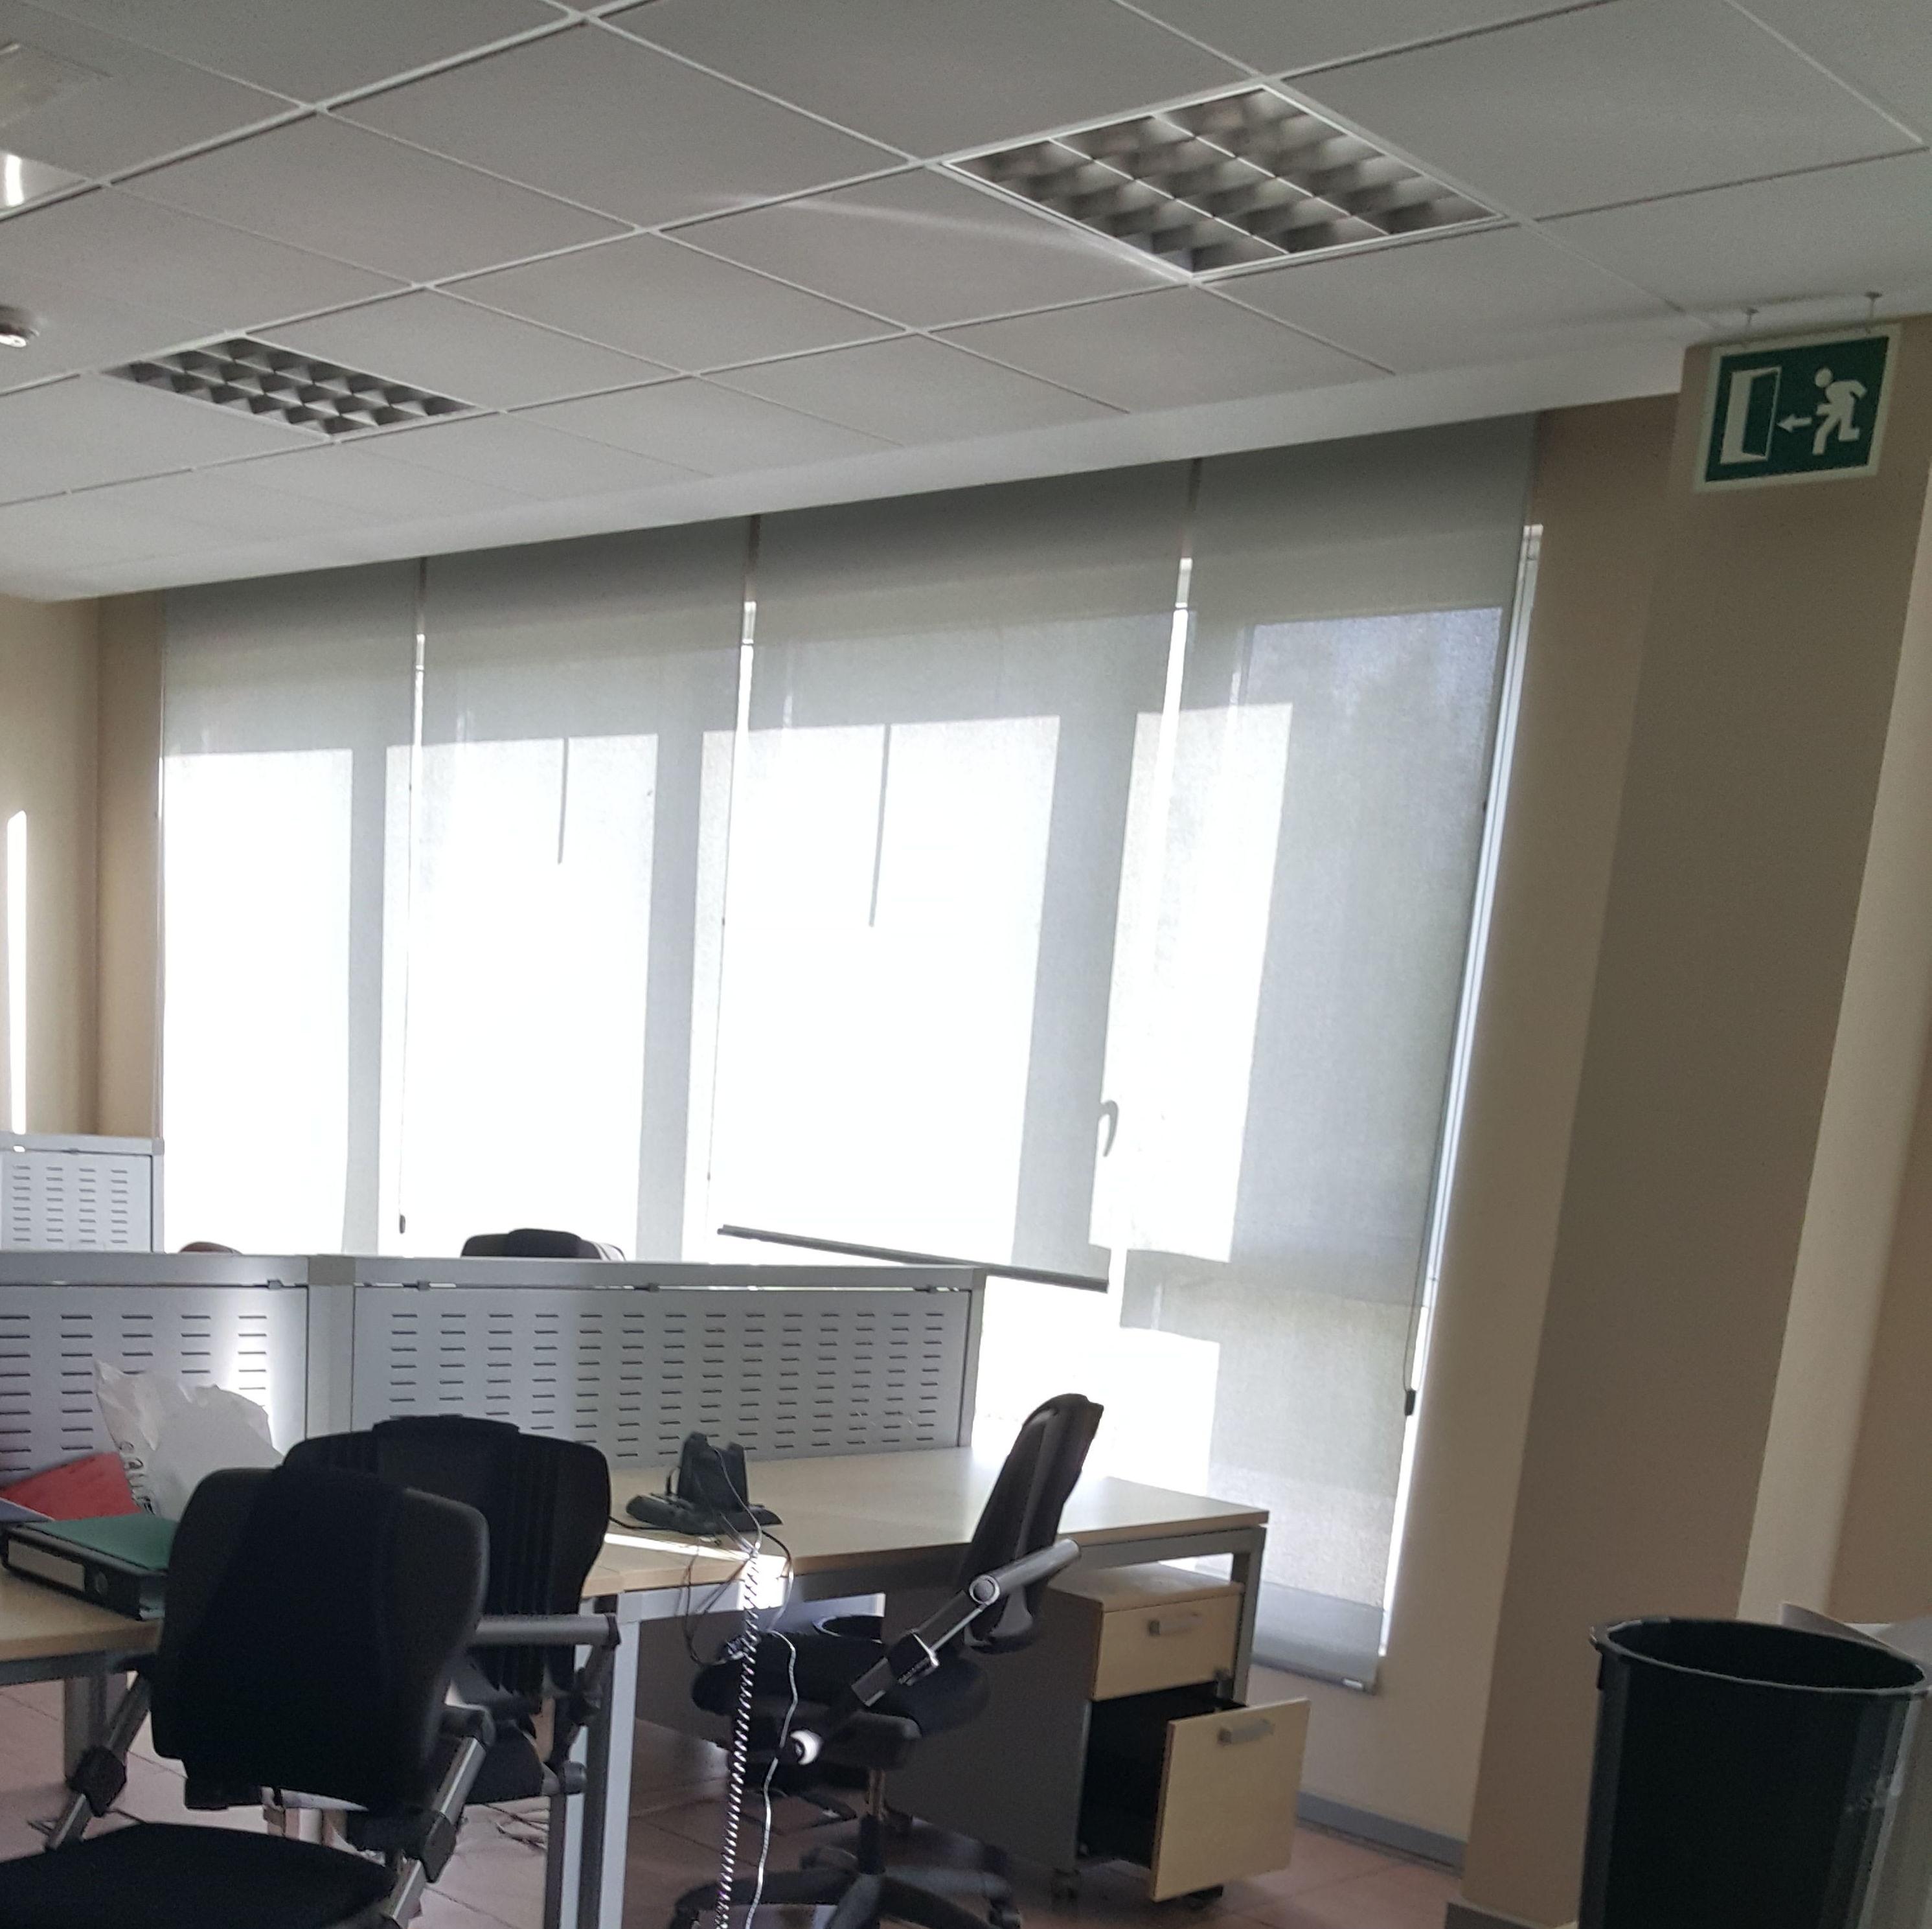 Foto 3 de Empresas de limpieza en BASOZABAL | Limpiezas La Fragua